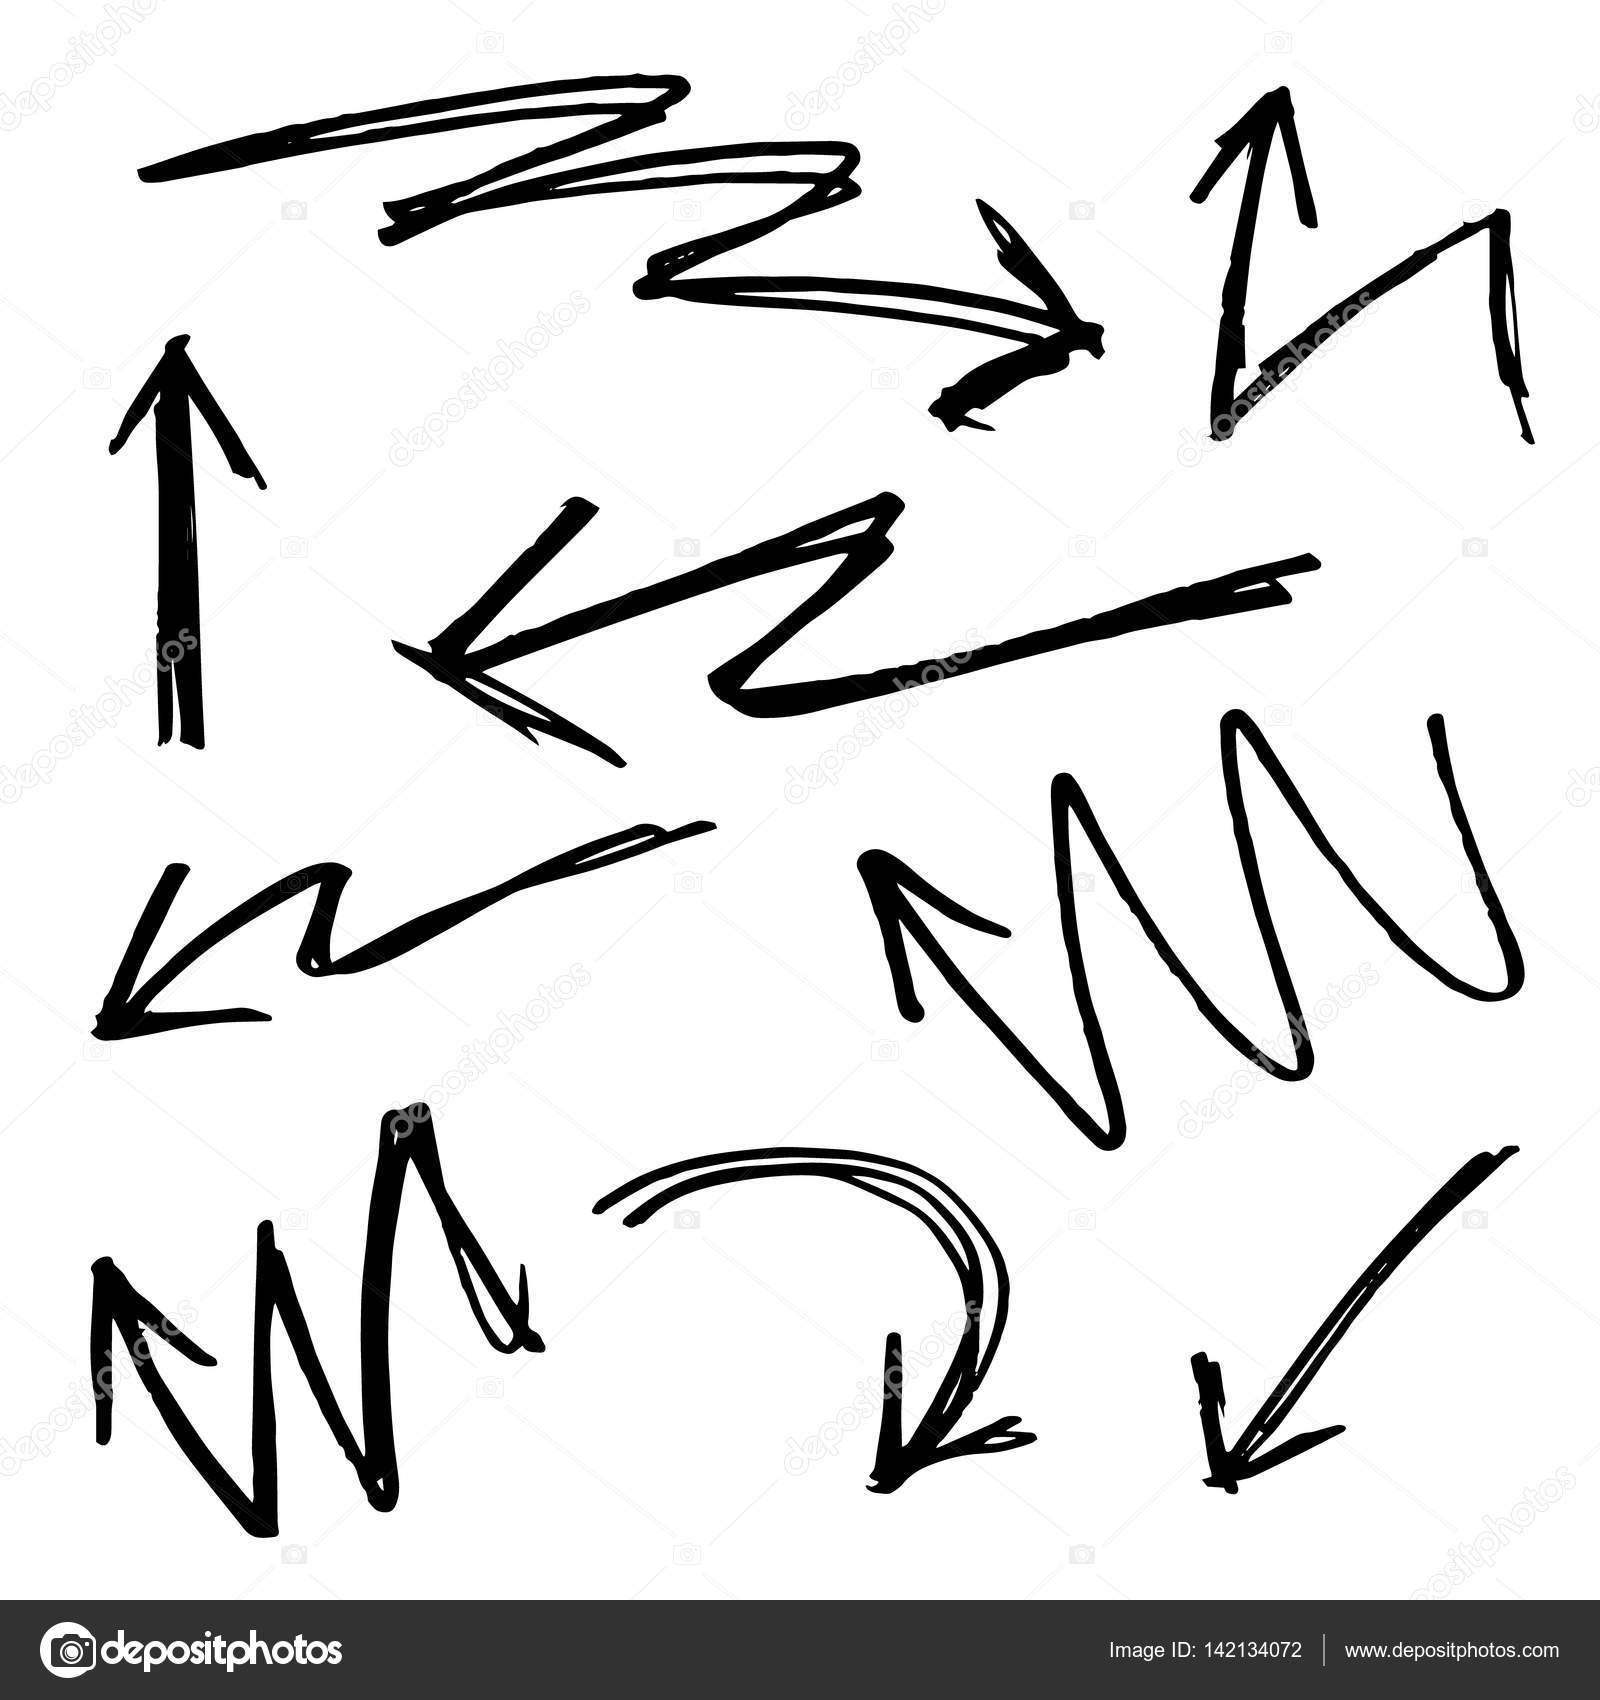 Drawn arrow pencil #5